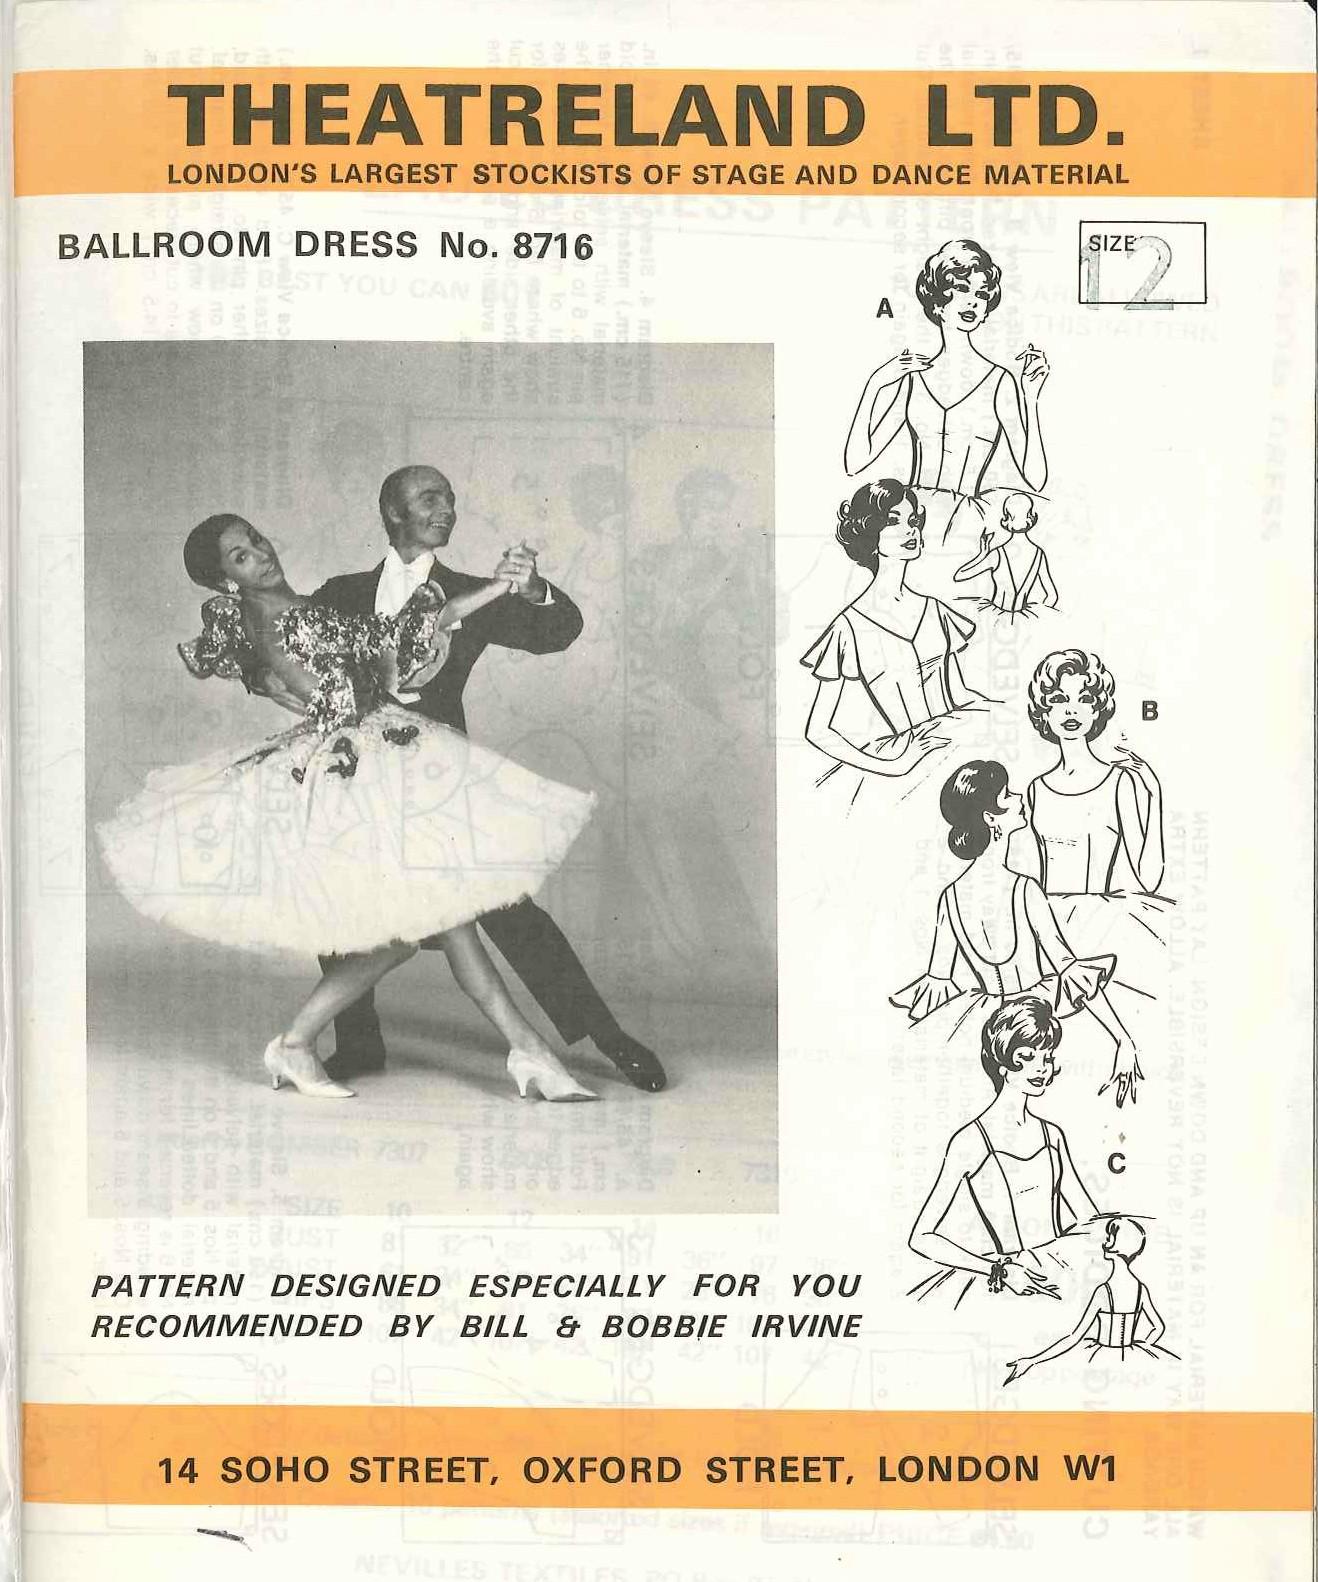 Theatreland Ballroom Dress 8716